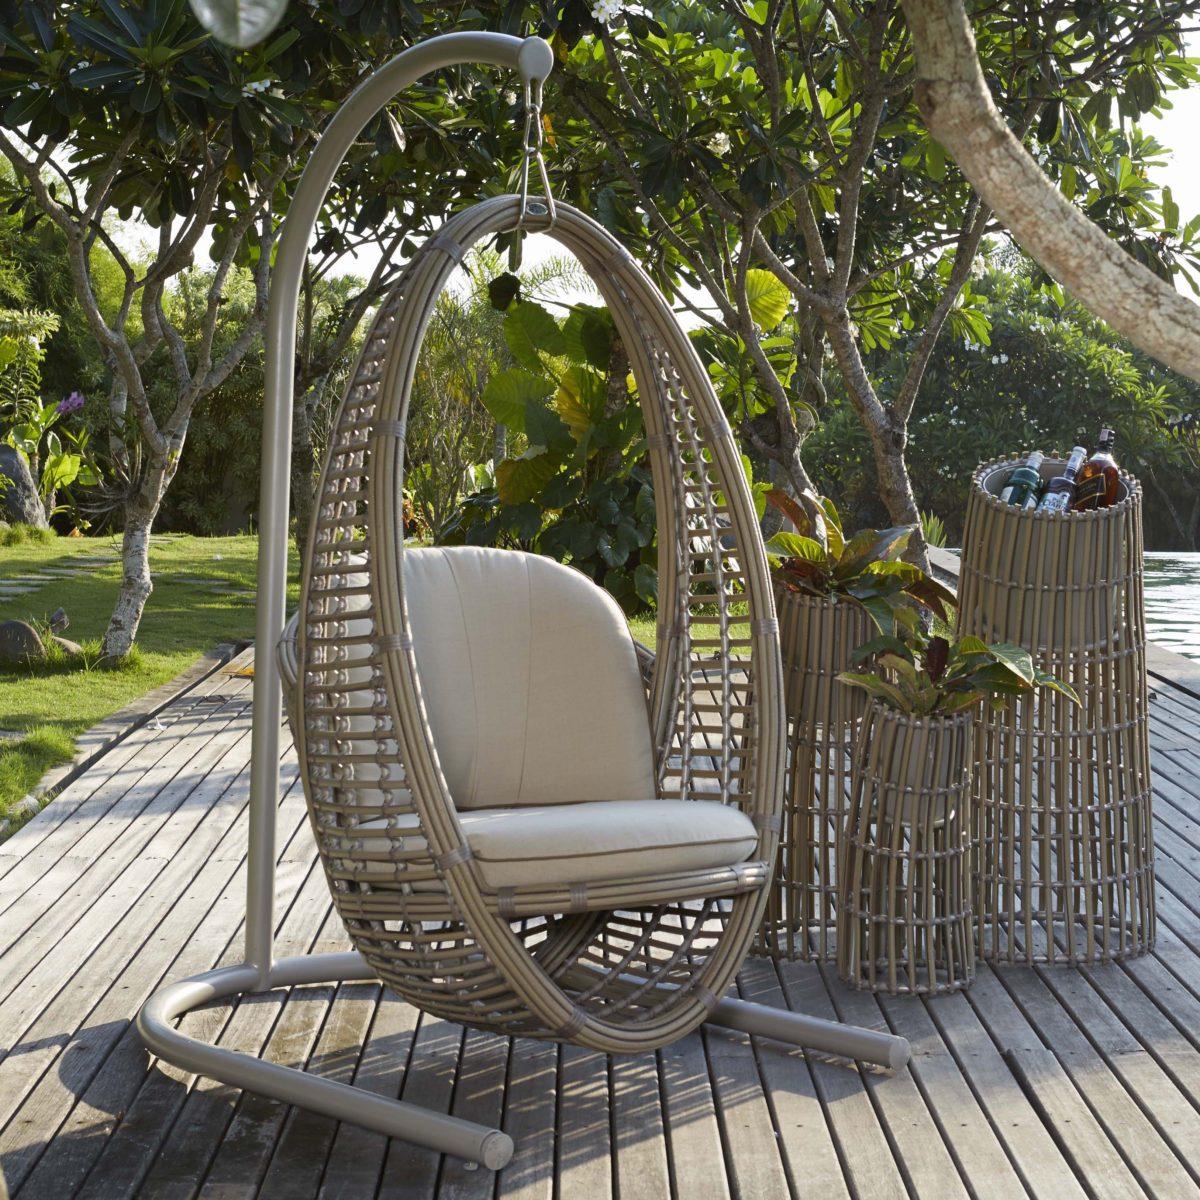 Heri Hanging Chair + Planters - KMNP